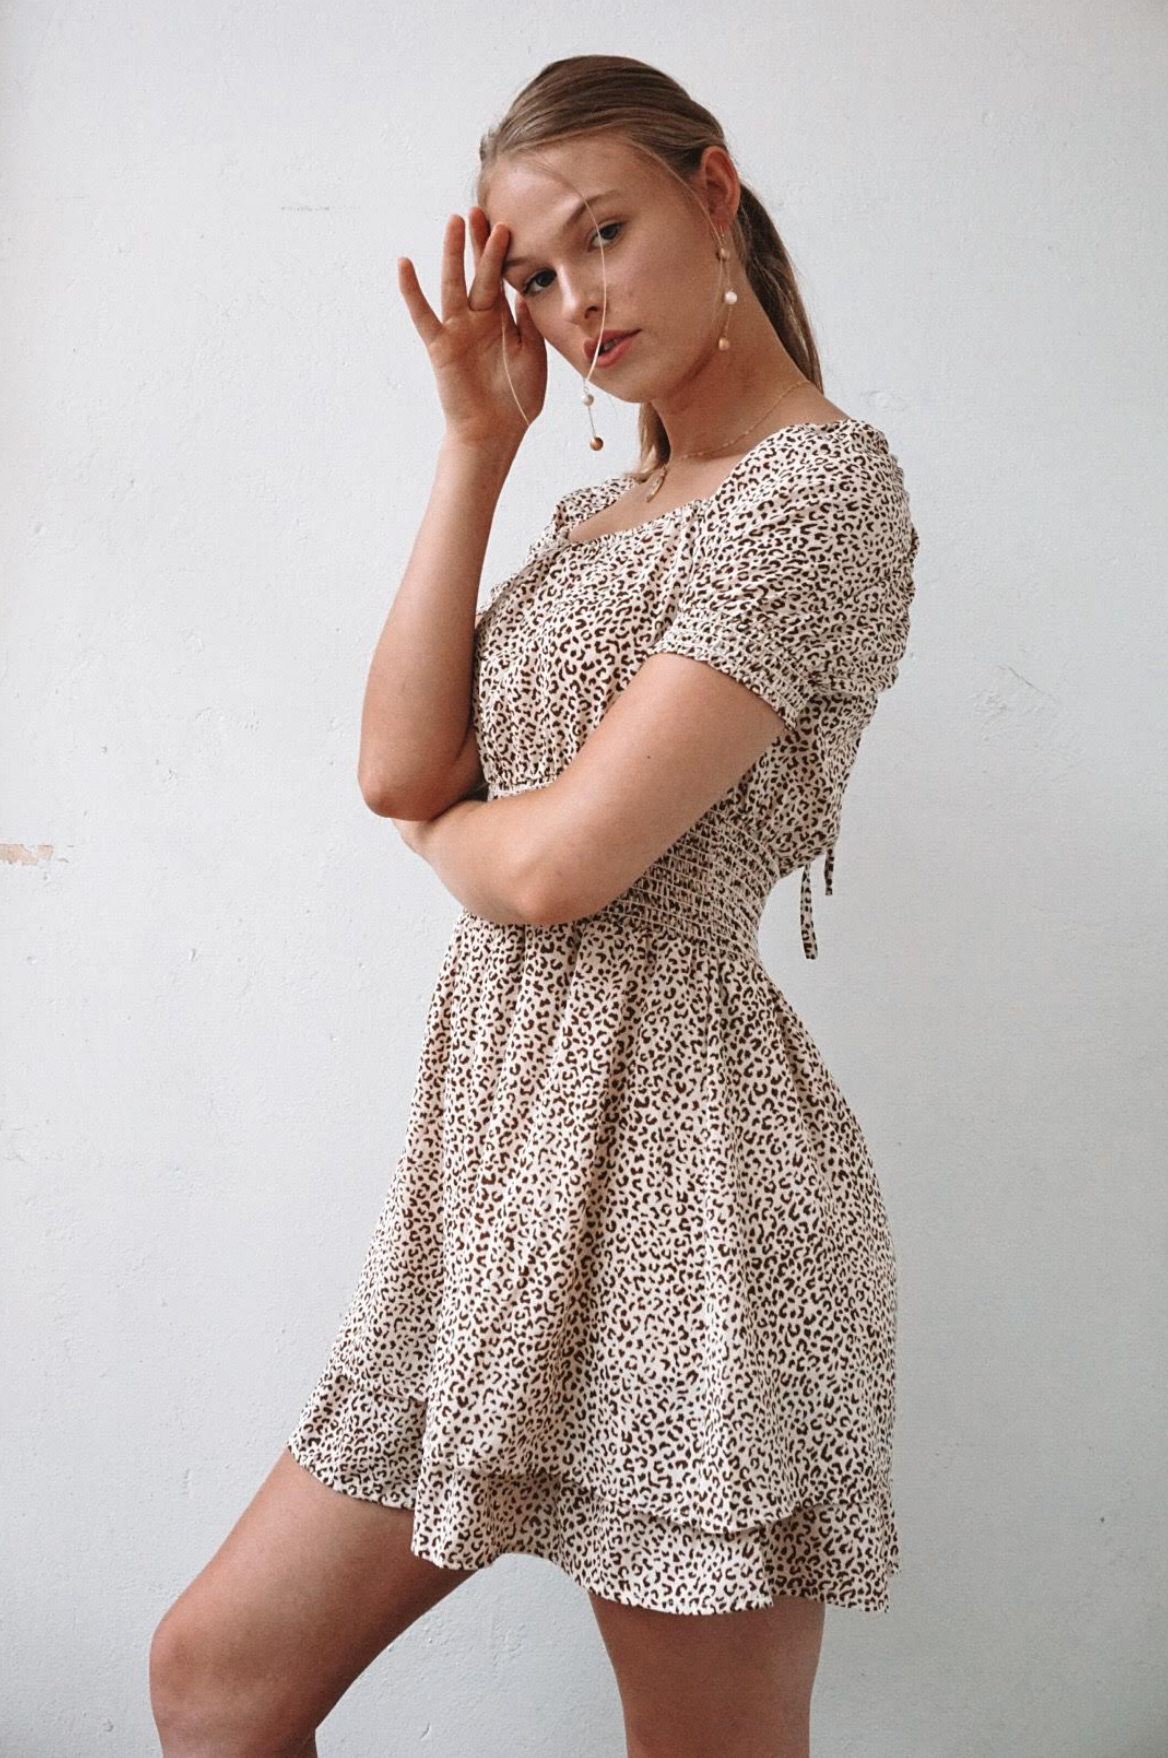 She & Sky No One's Purrfect Dress